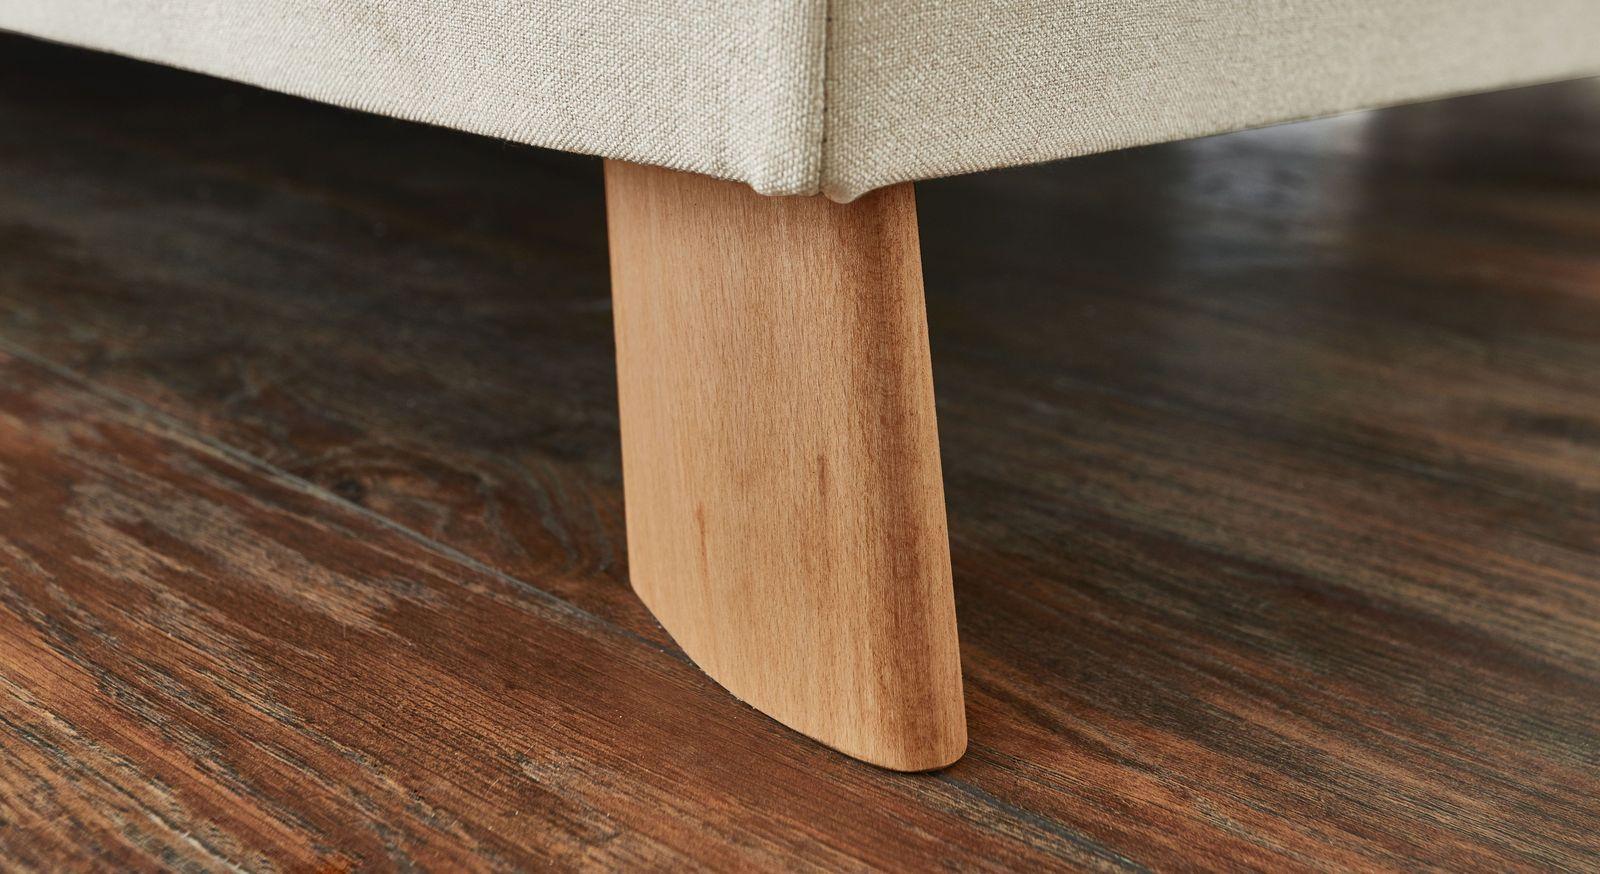 flexibles boxspringbett selbst zusammenstellen summerford. Black Bedroom Furniture Sets. Home Design Ideas